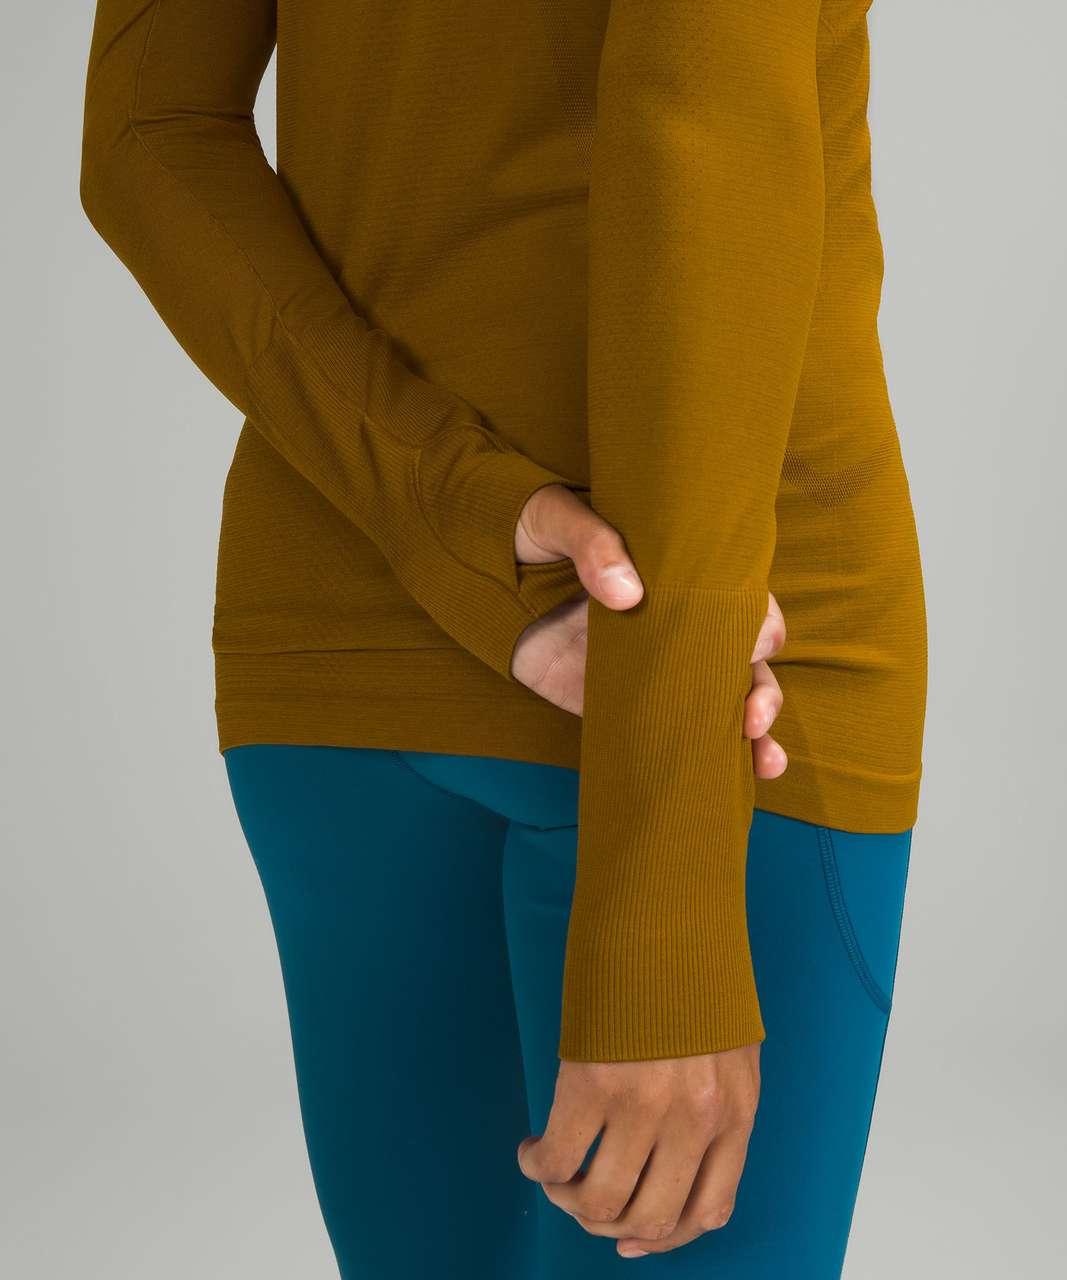 Lululemon Swiftly Tech Long Sleeve Shirt 2.0 - Gold Spice / Gold Spice